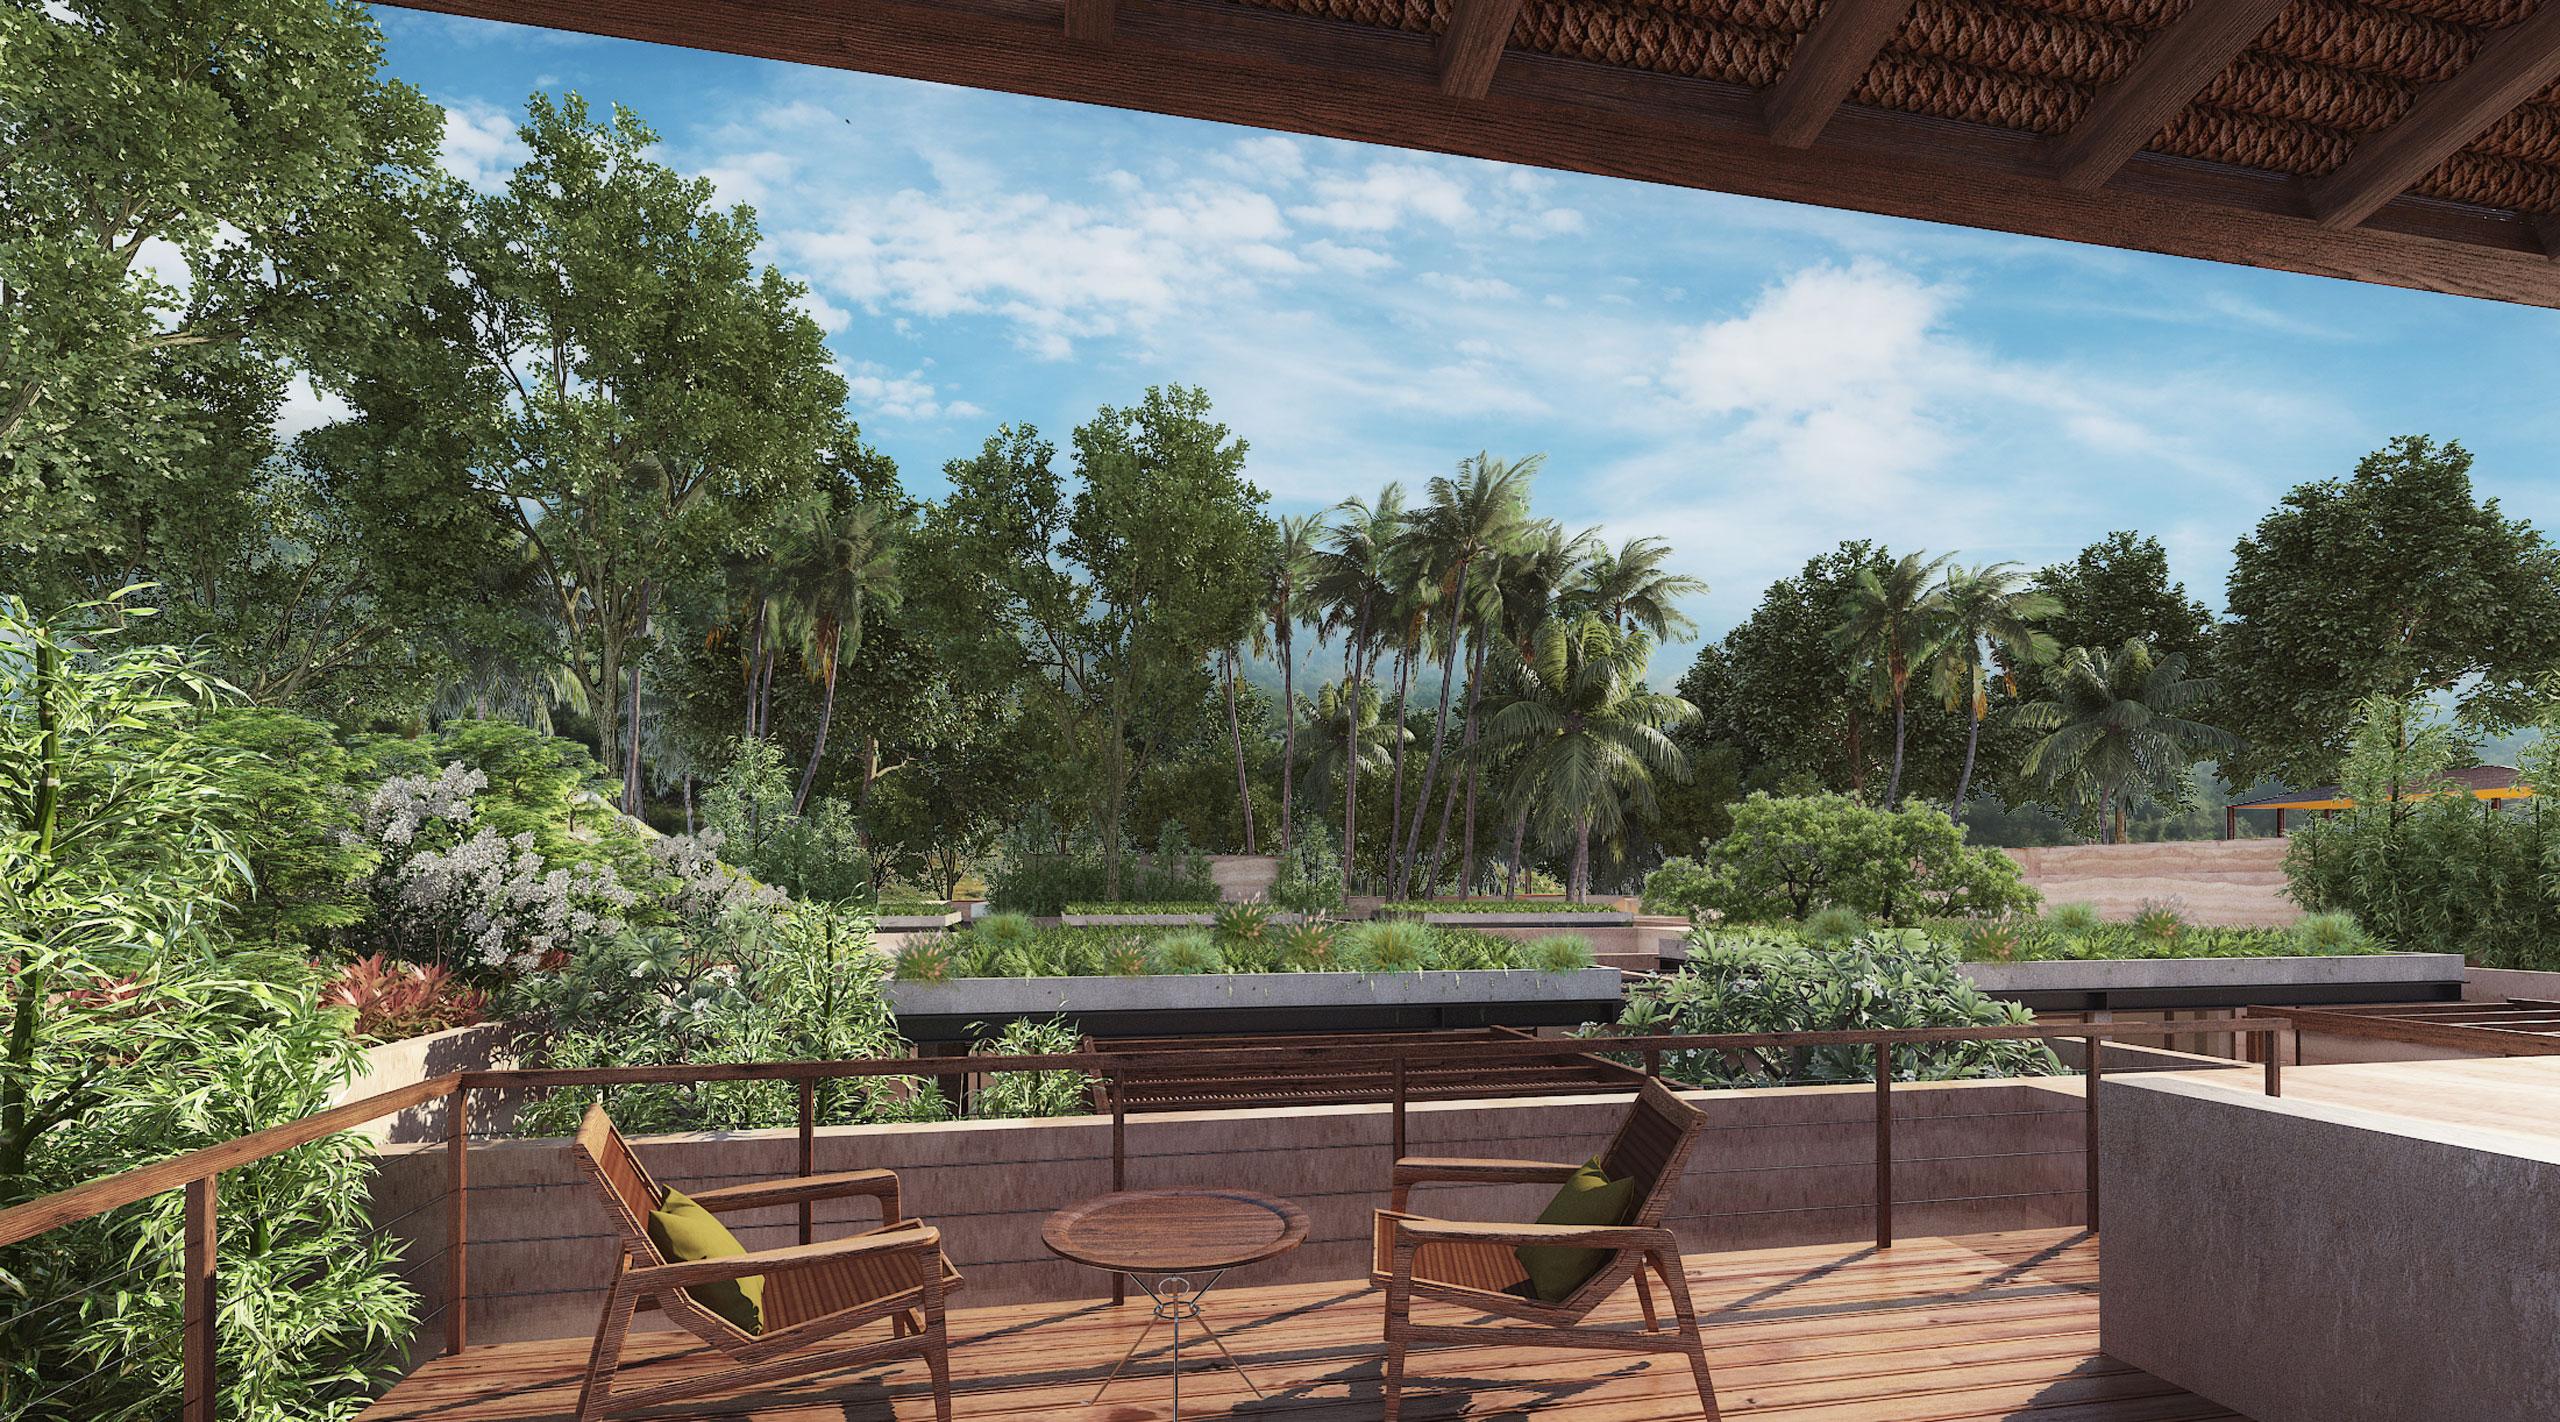 Mandwa Resort - view of landscape